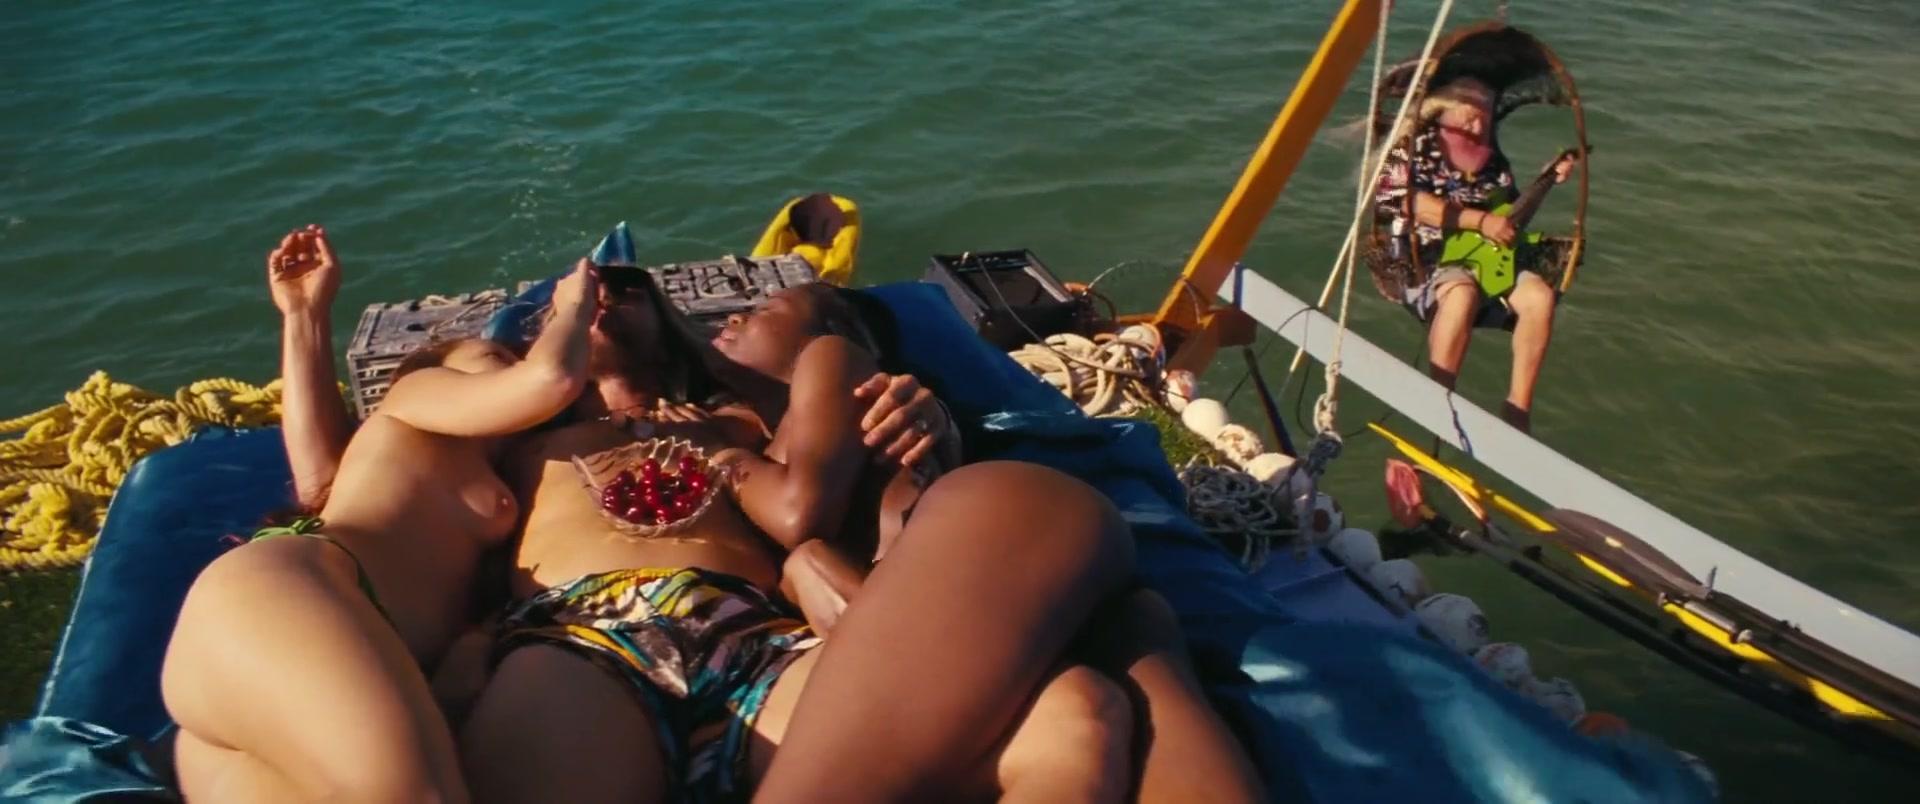 Isla Fisher Nude Photos isla fisher nude - the beach bum (2019) » nude celebs tube